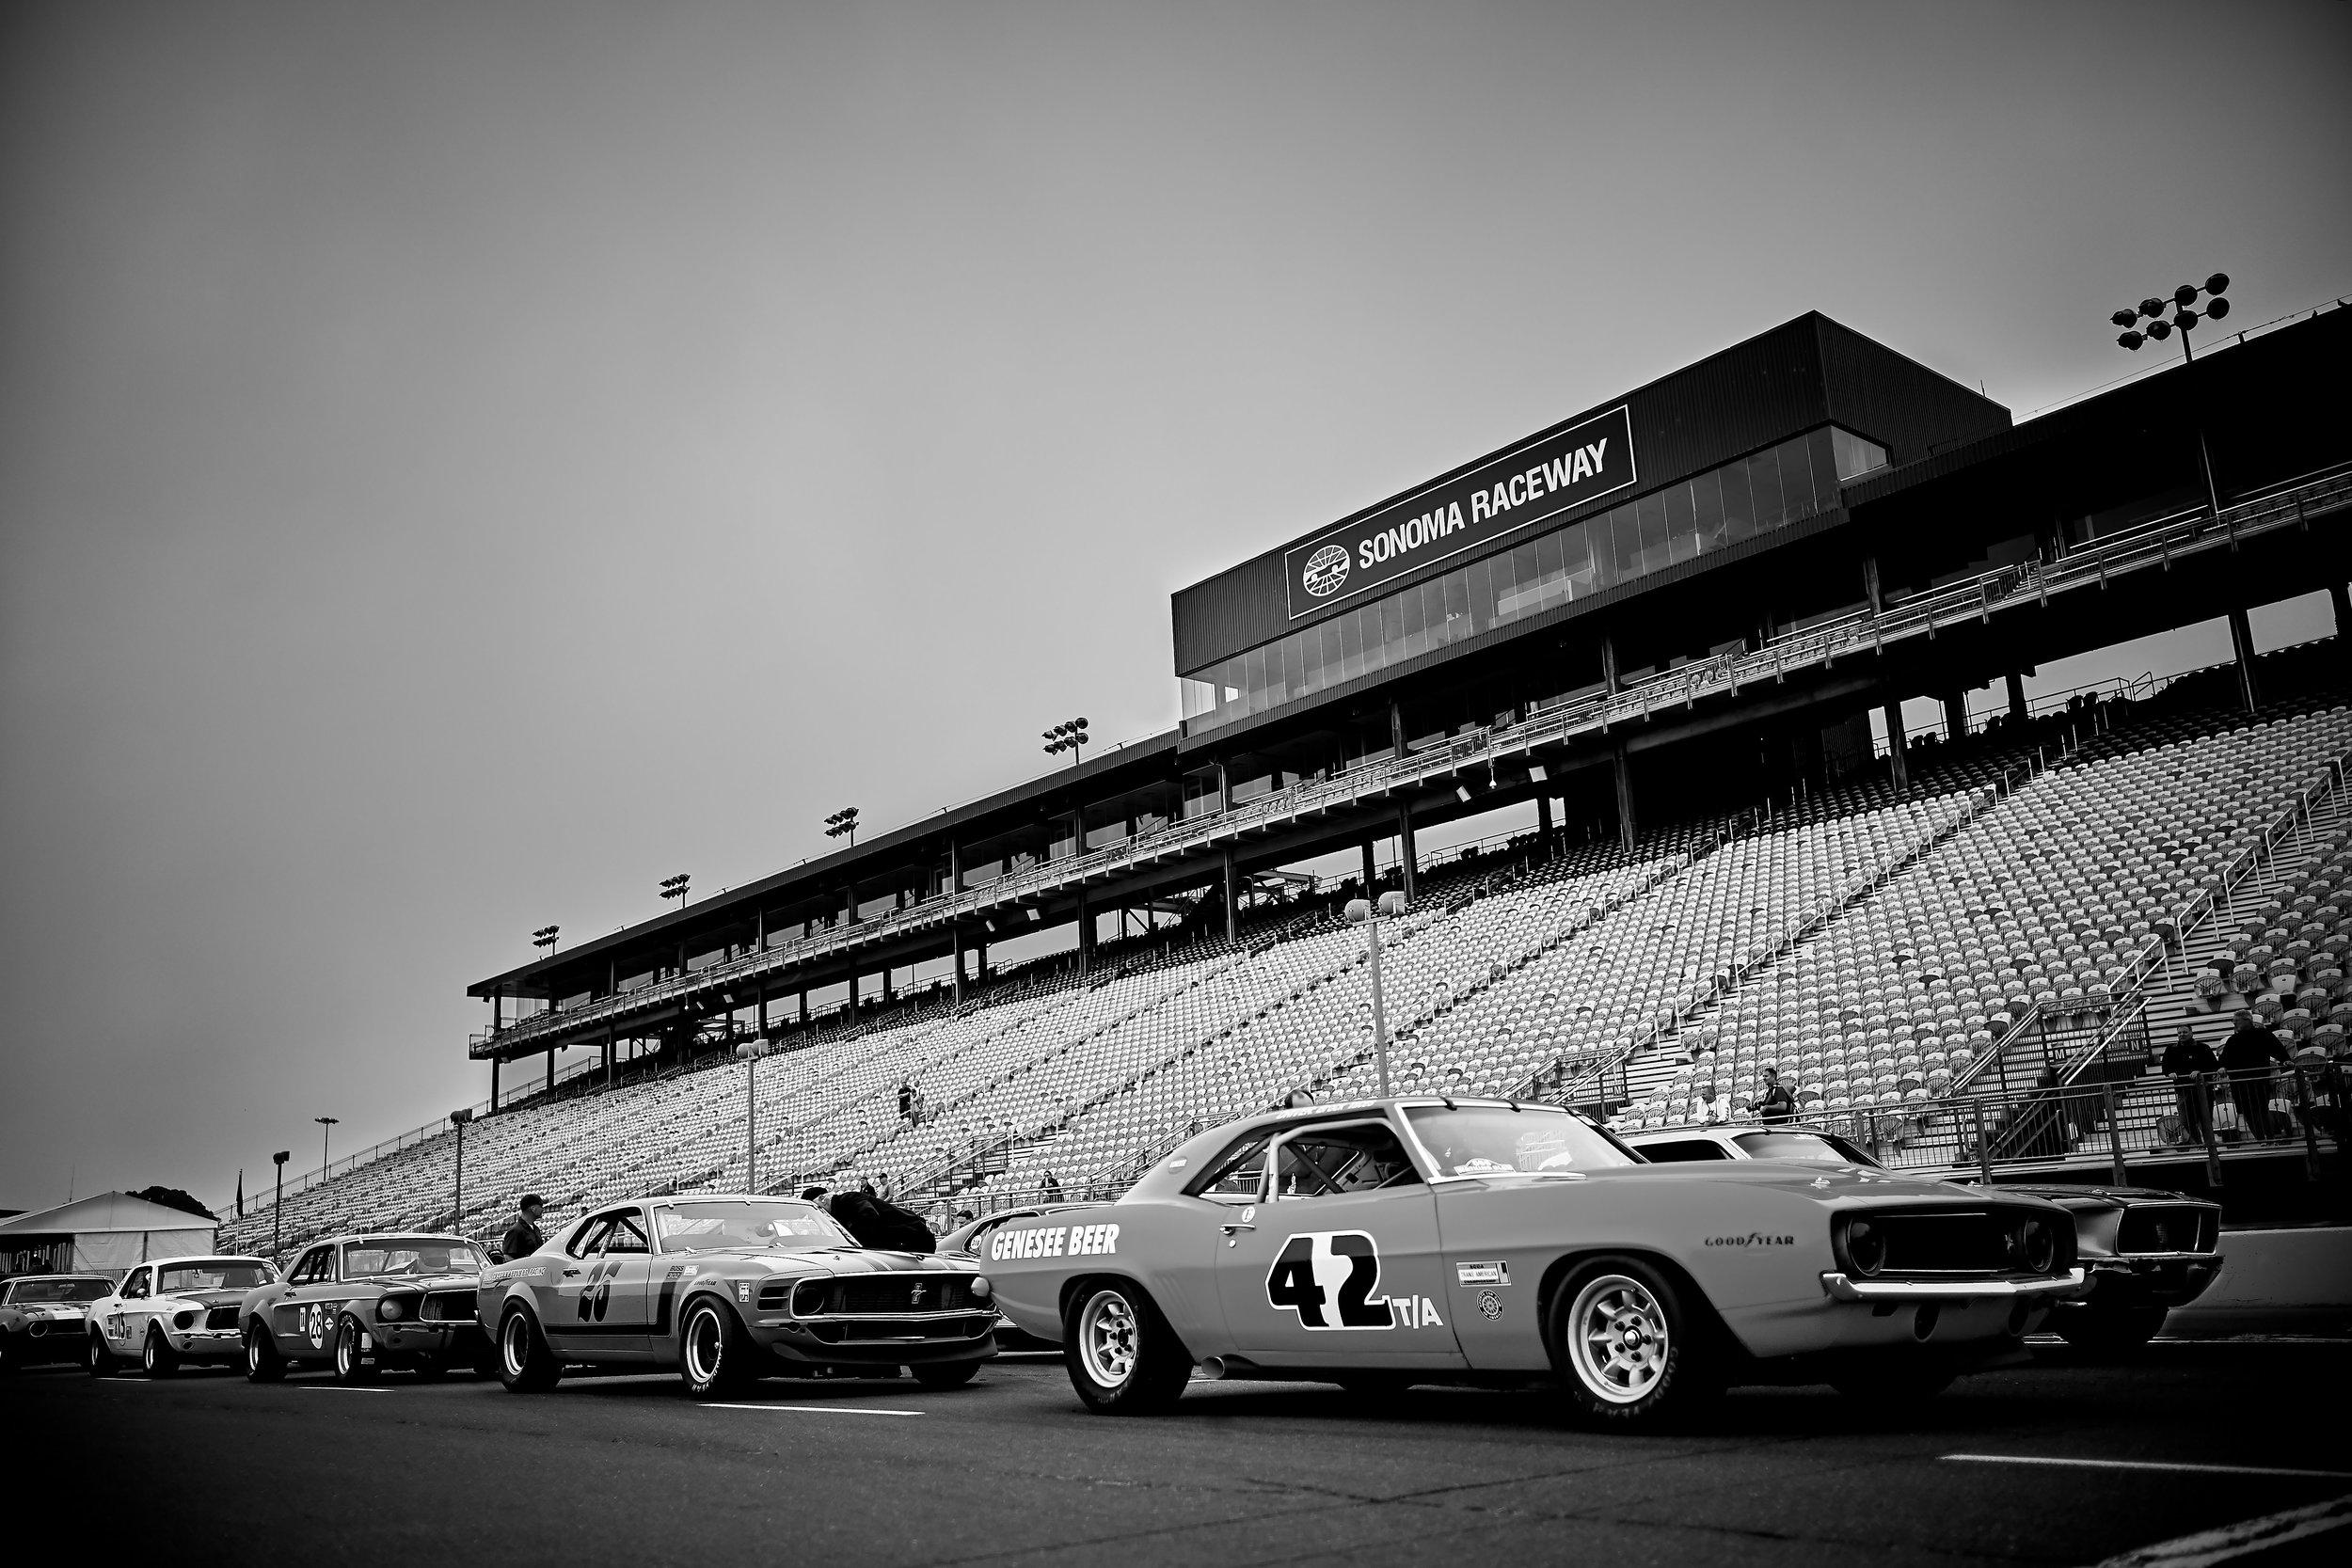 1969 Chevrolet Z28 (Car #42) [Race Group Practice Session, 1966-1972 Historic Trans-Am Cars]